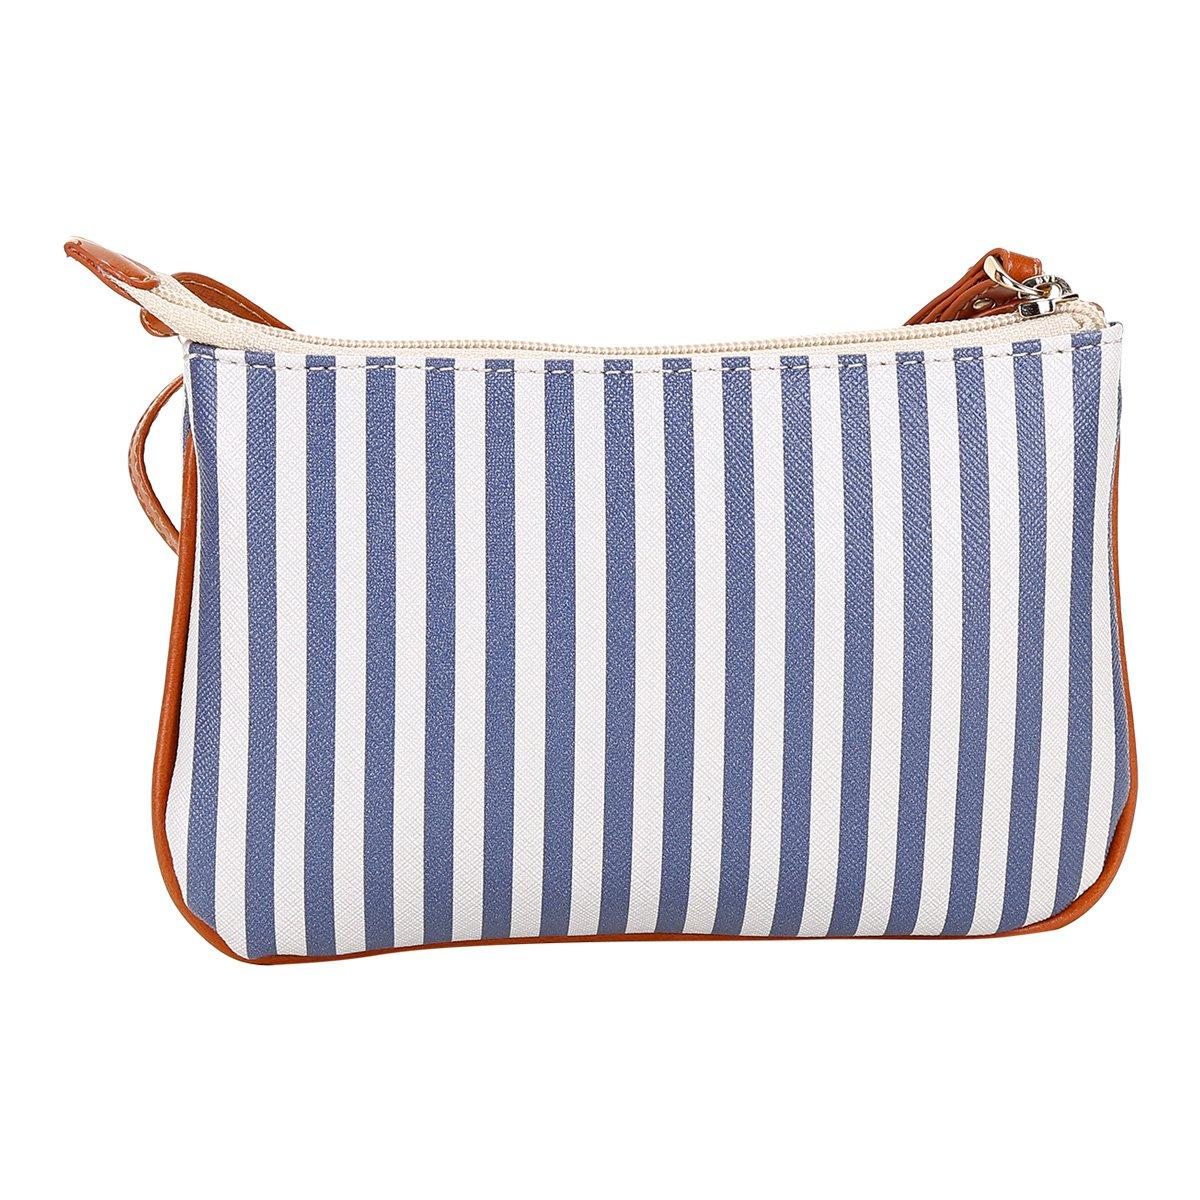 2afa8d05f Bolsa Dumond Mini Bag Listrada Feminina - Compre Agora   Zattini